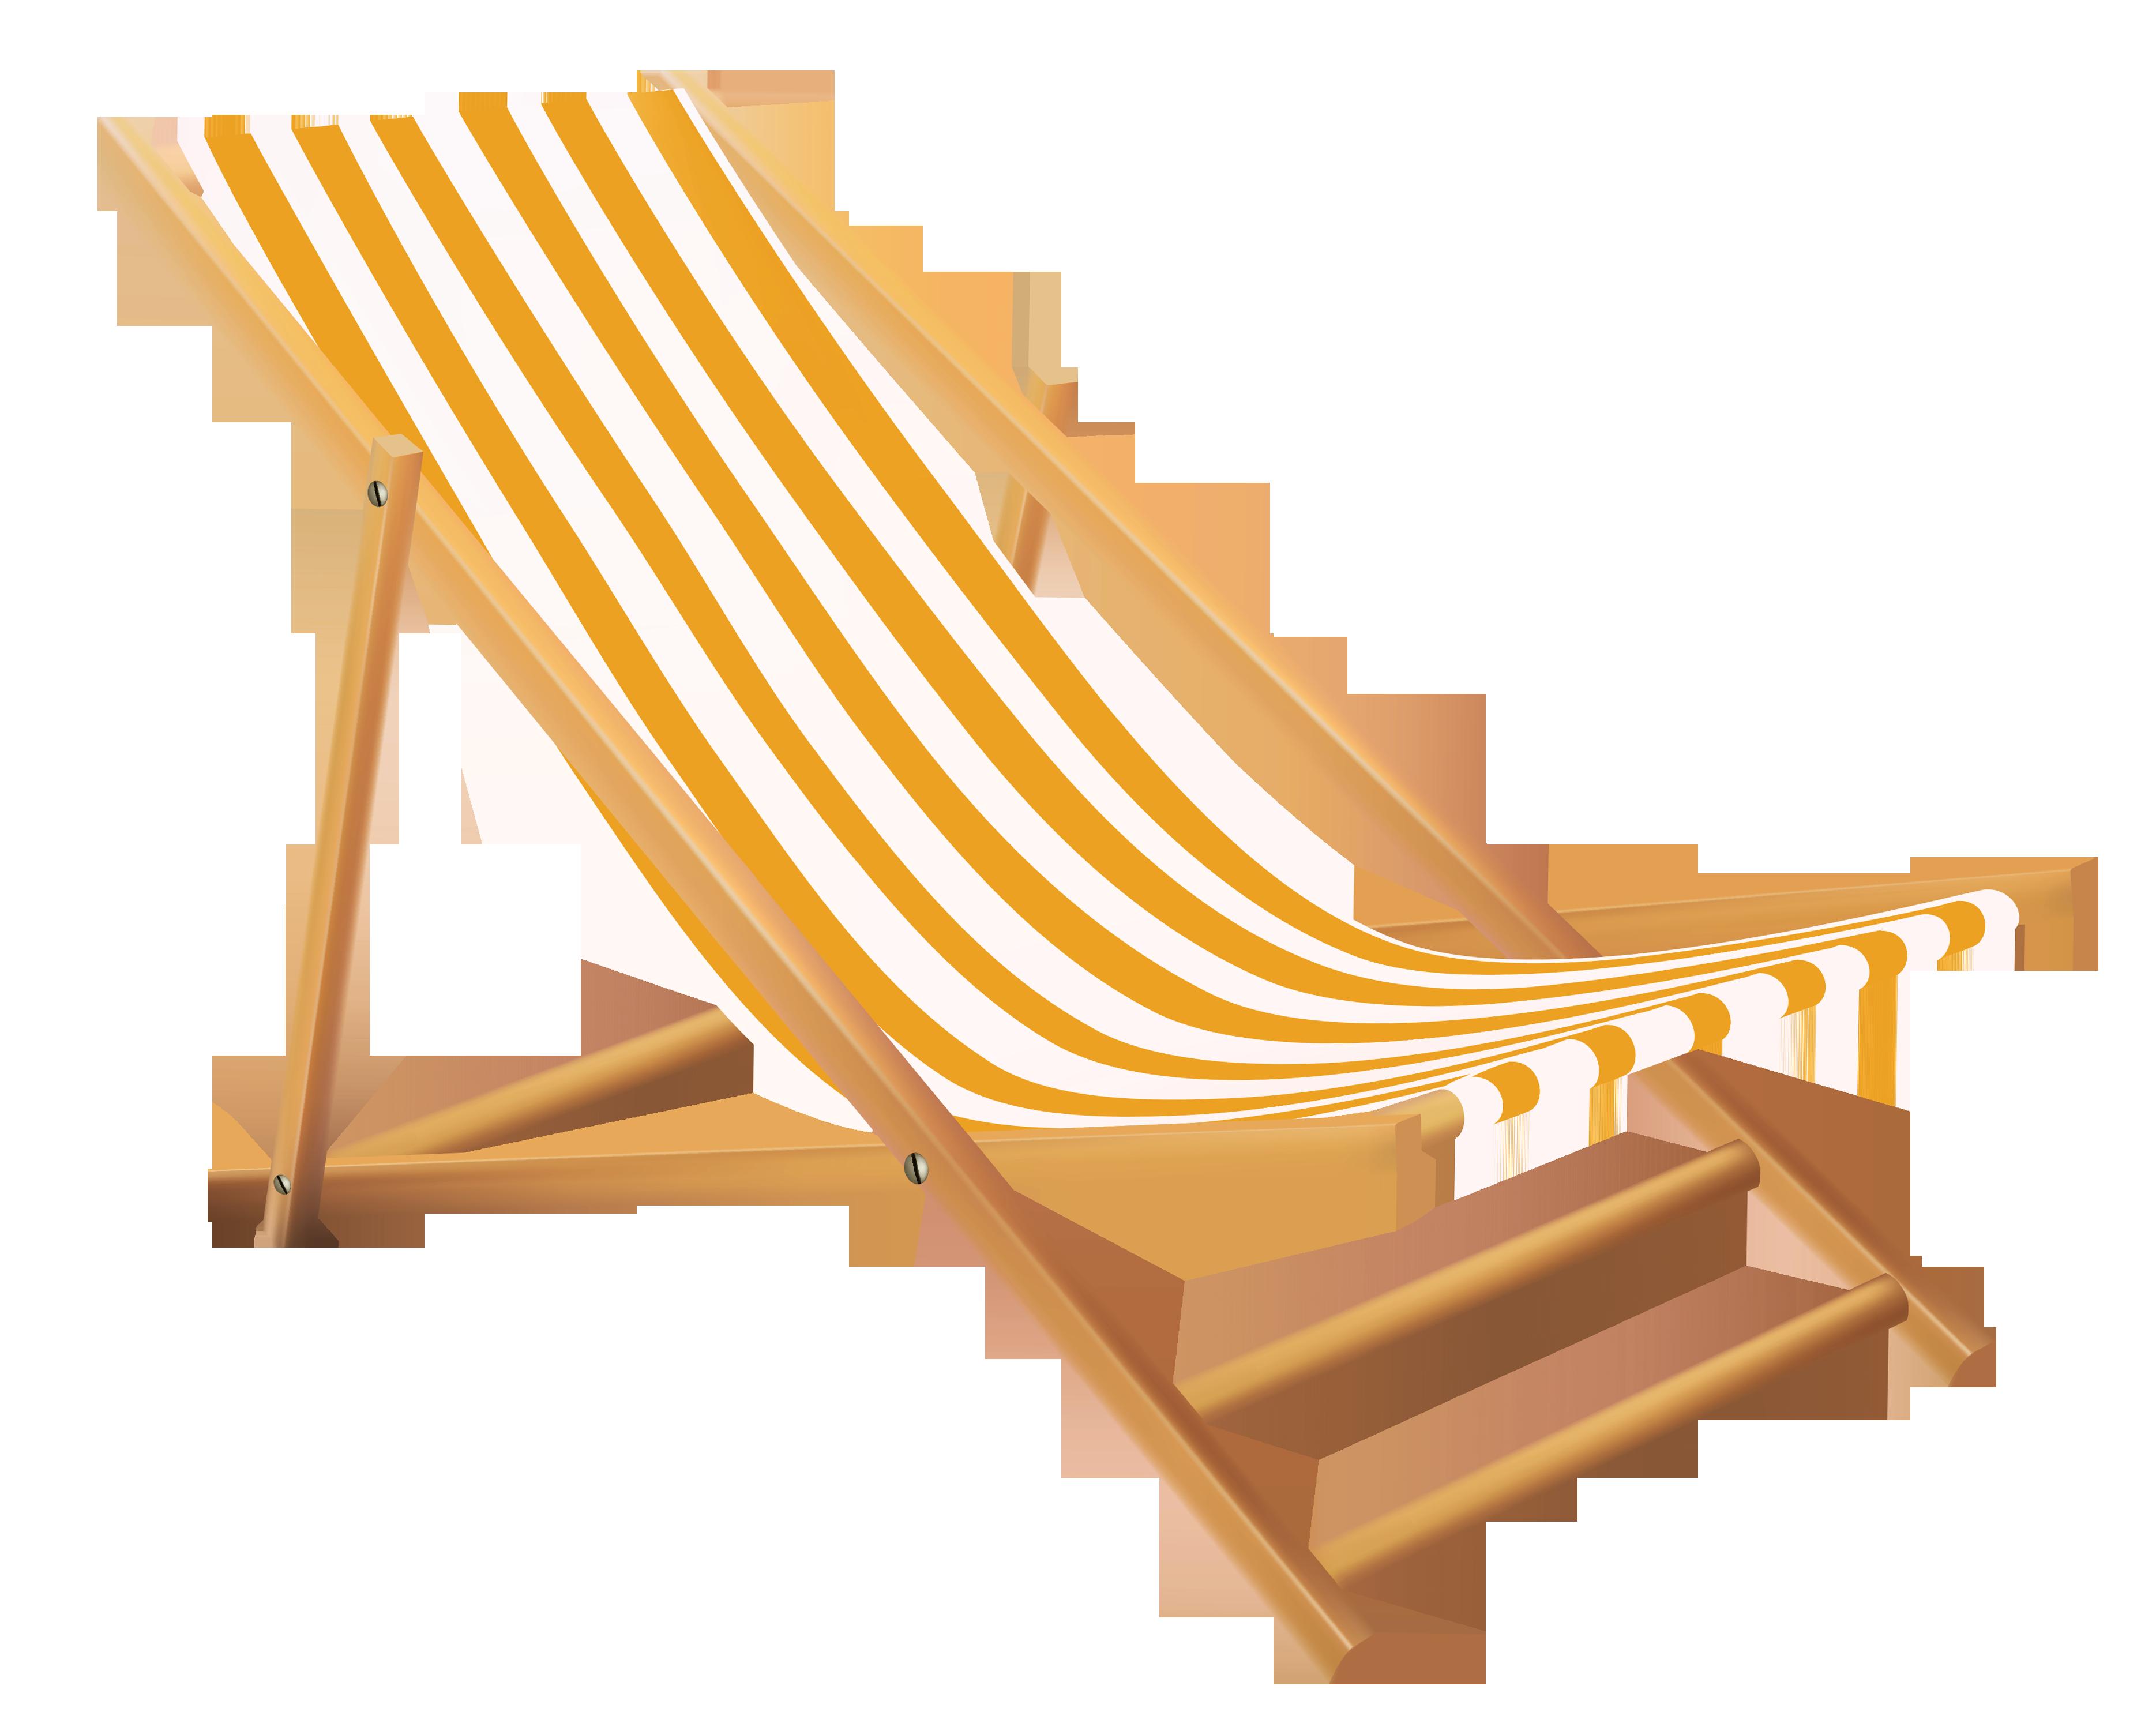 Beach lounge chair gallery. Furniture clipart transparent